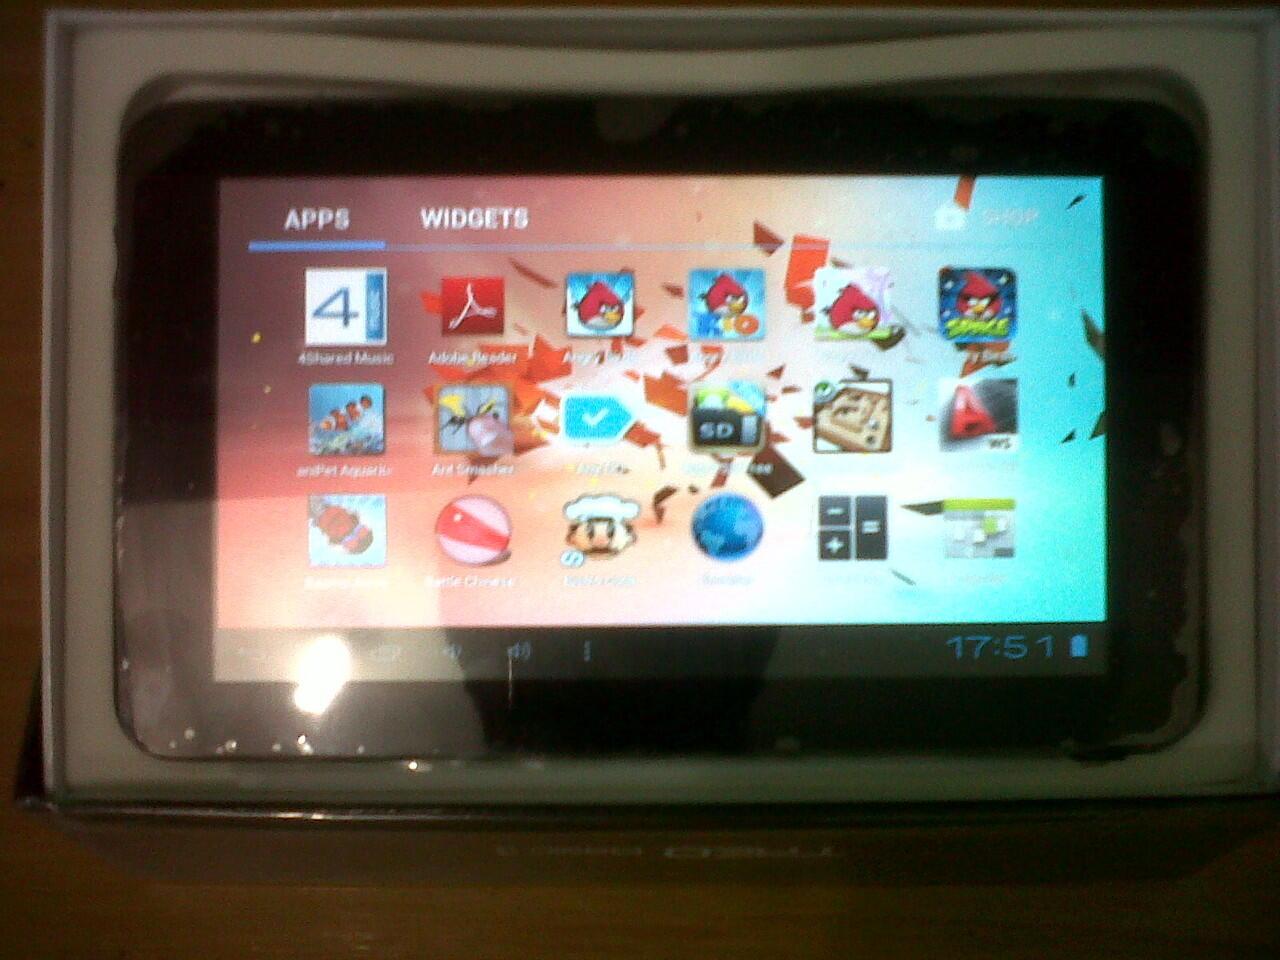 tablet pc ipad apad epad mid merk TREQ A10 BASIC 3 cortex A13 1,2 GHz. Game 3D, FULL